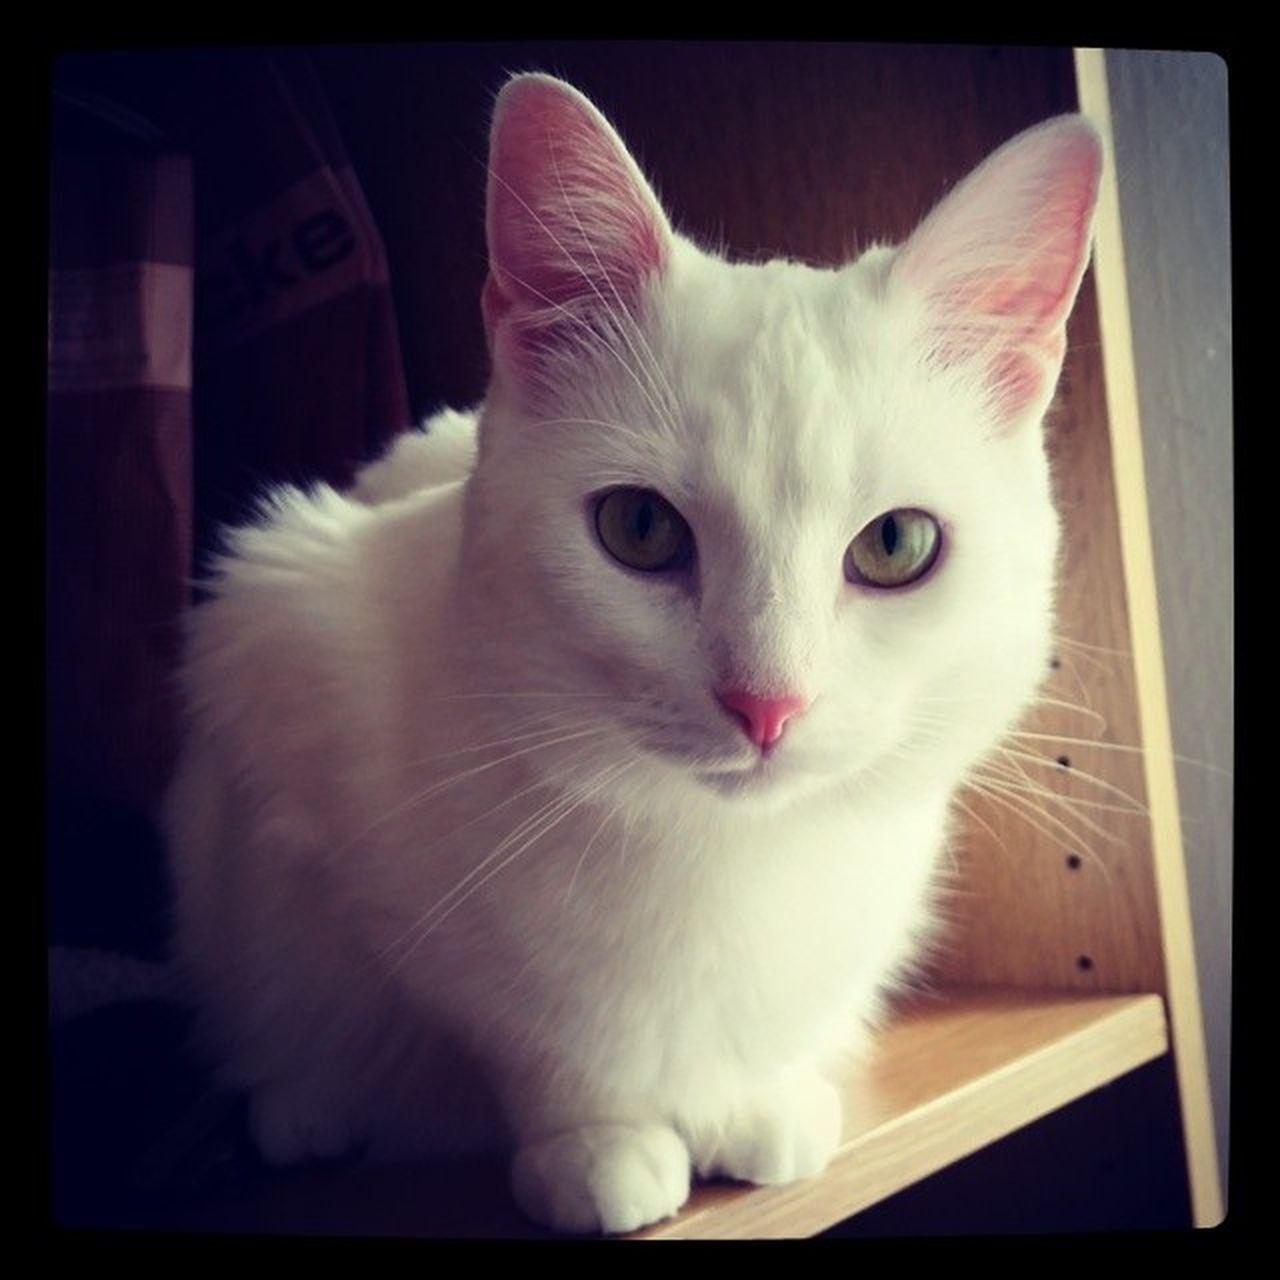 domestic cat, cat, feline, domestic, pets, indoors, mammal, domestic animals, no people, friendship, close-up